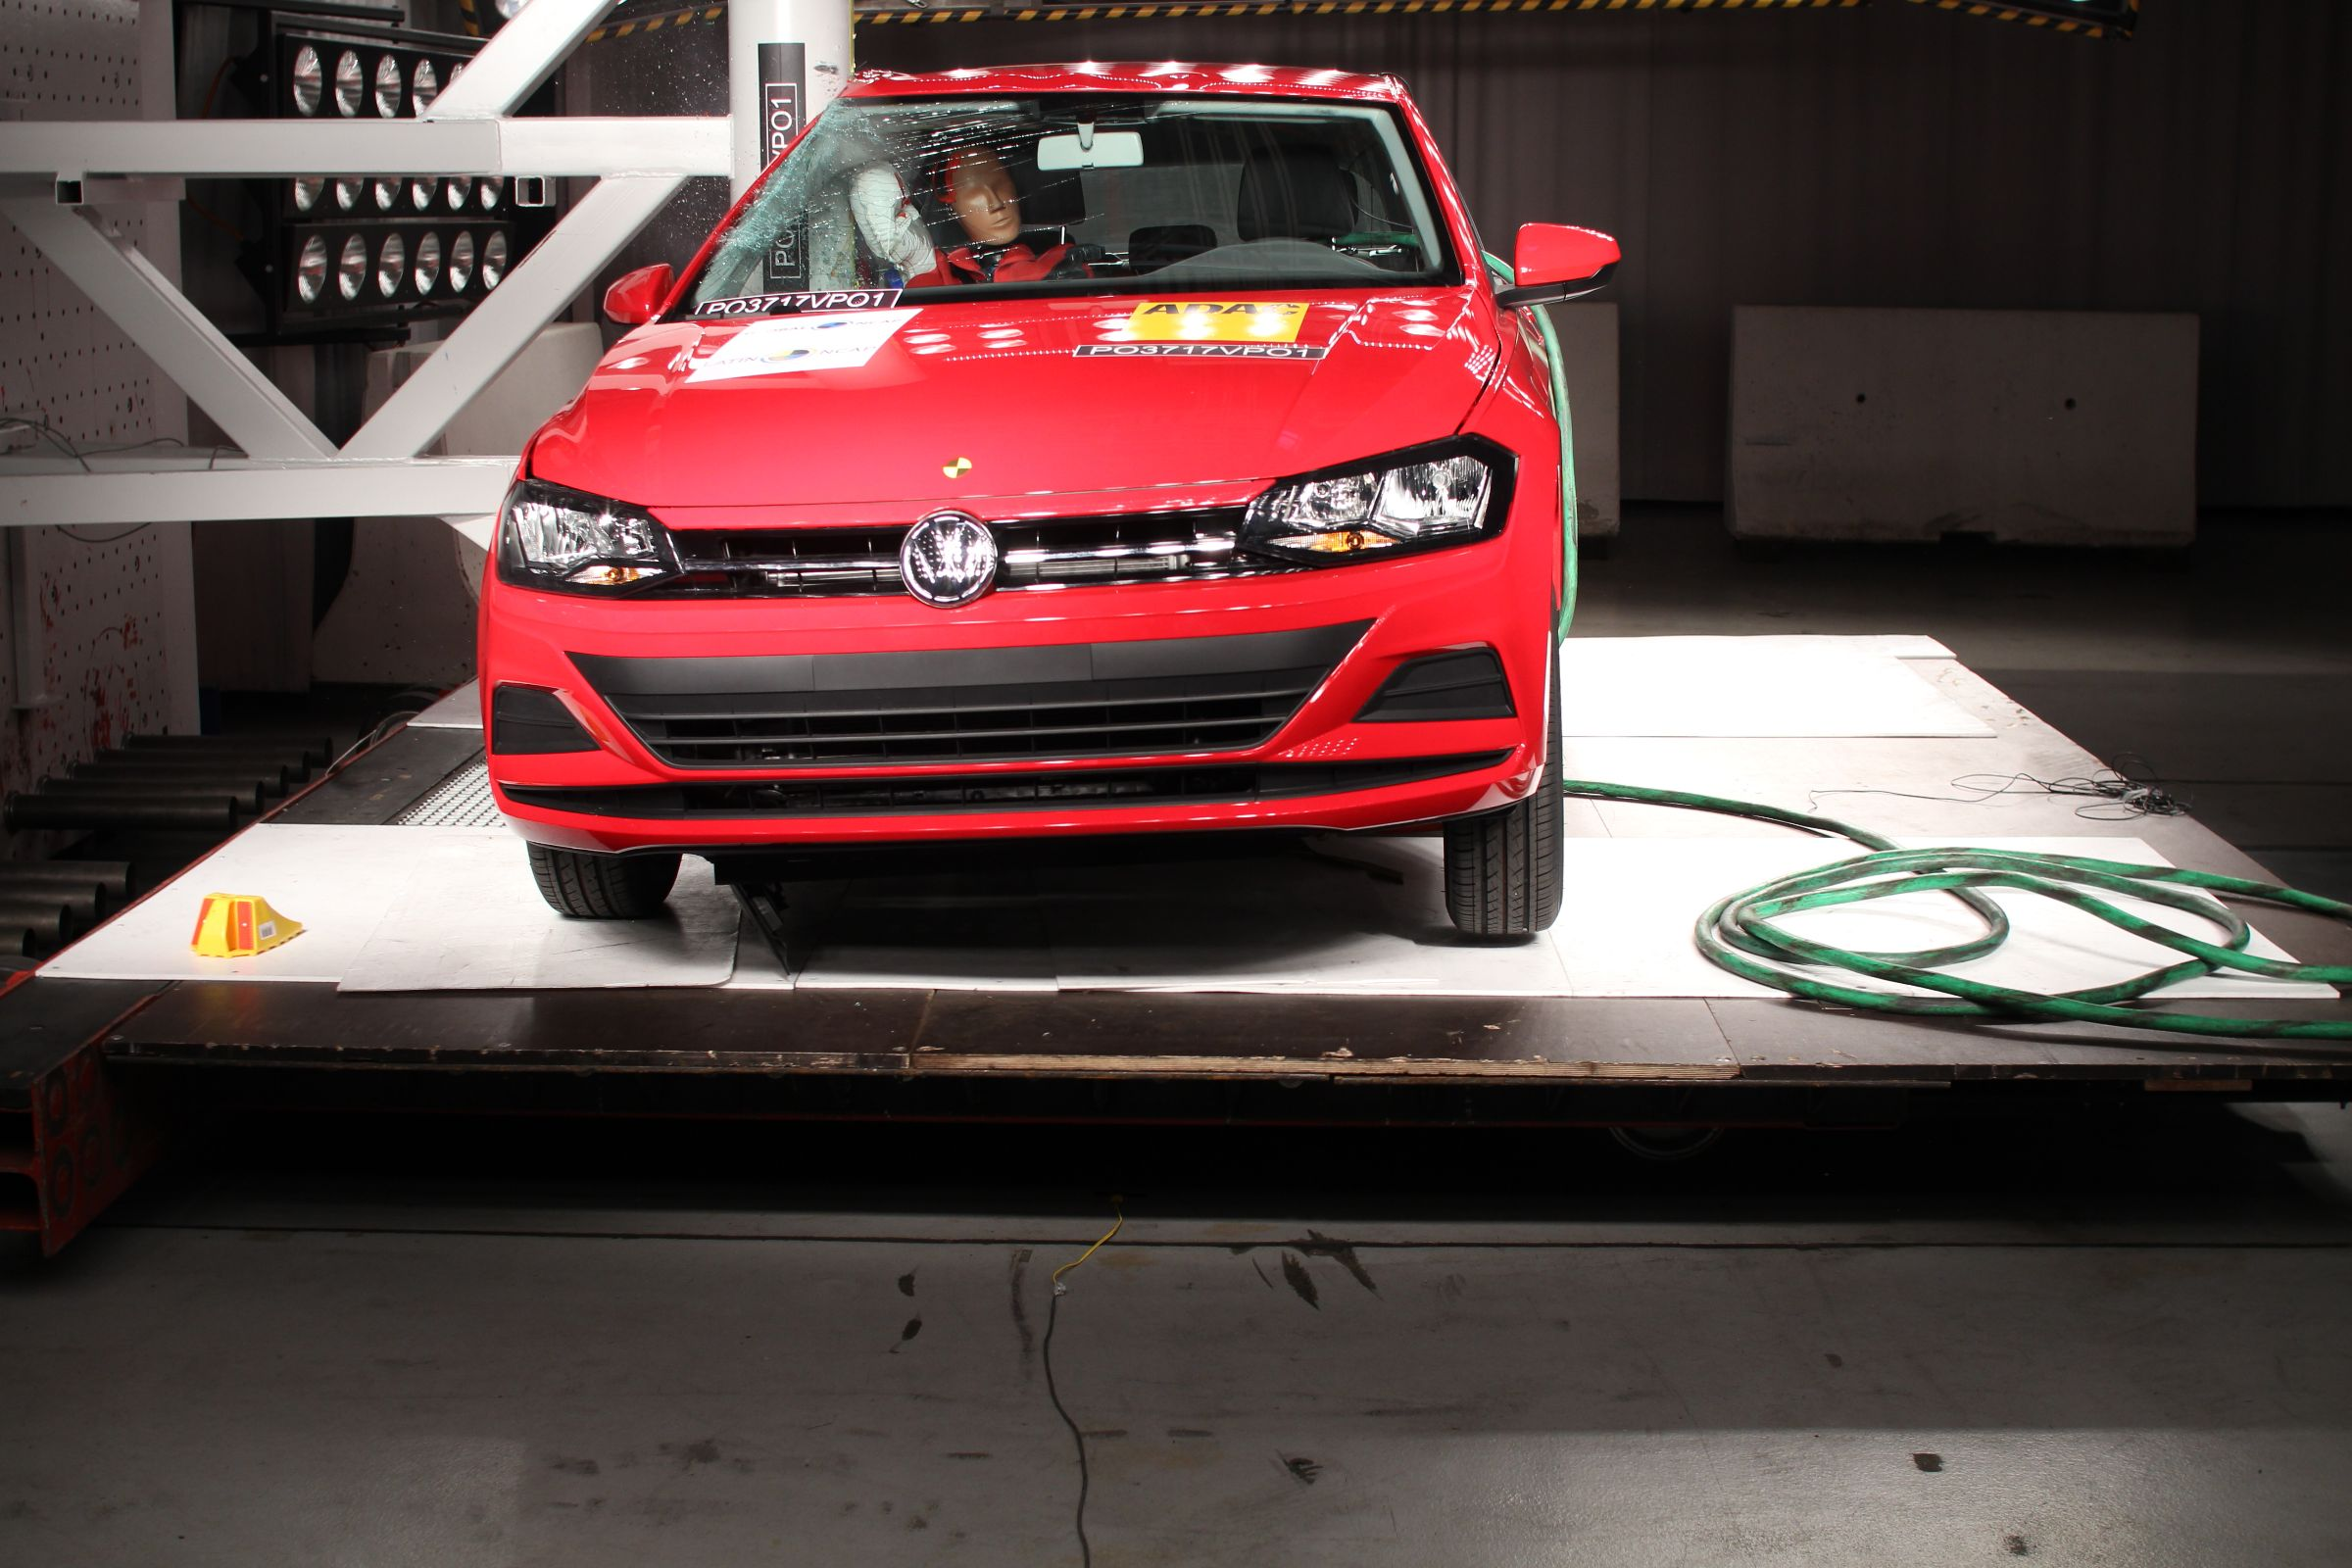 Em crash test,VW Virtus obteve nota máxima